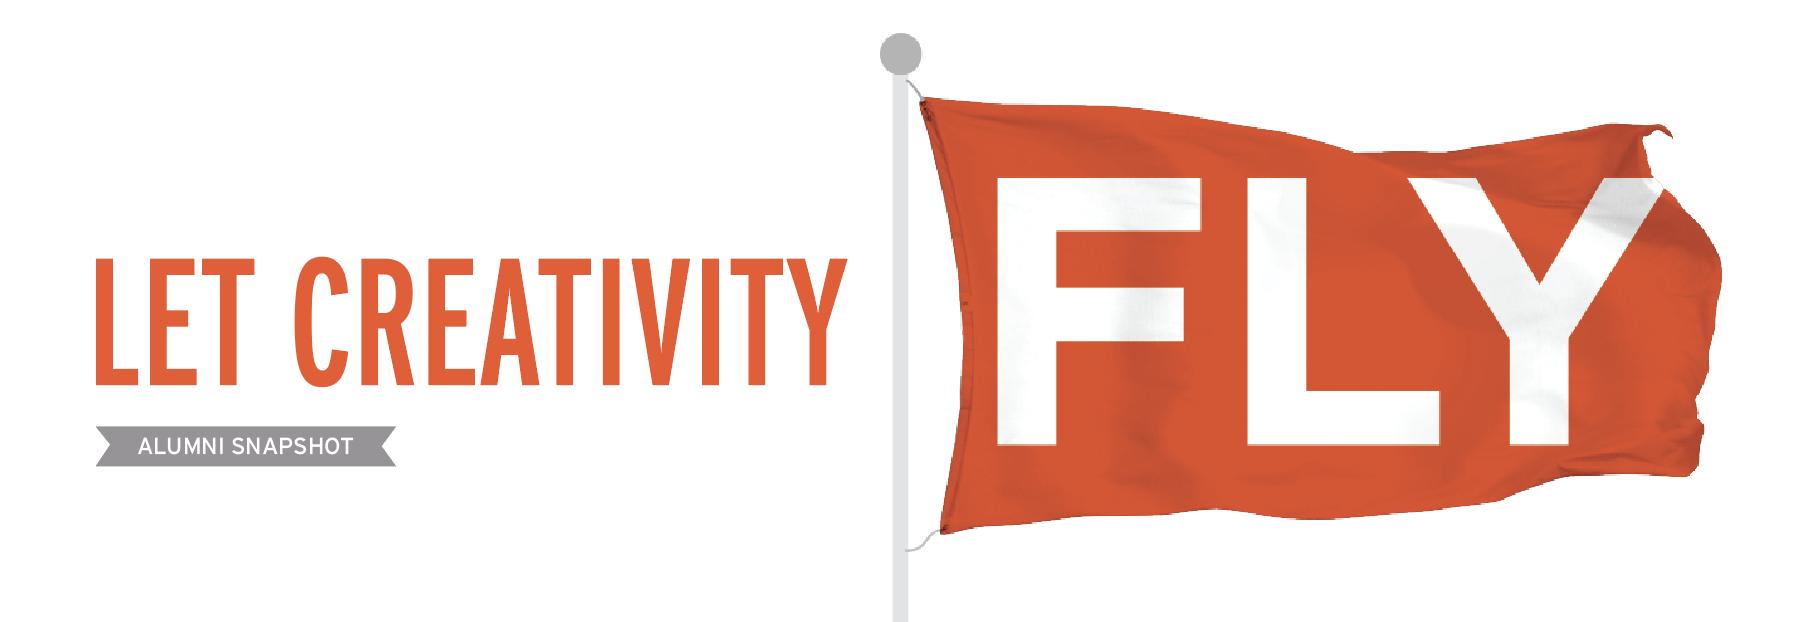 Let Creativity Fly Alumni Snapshot